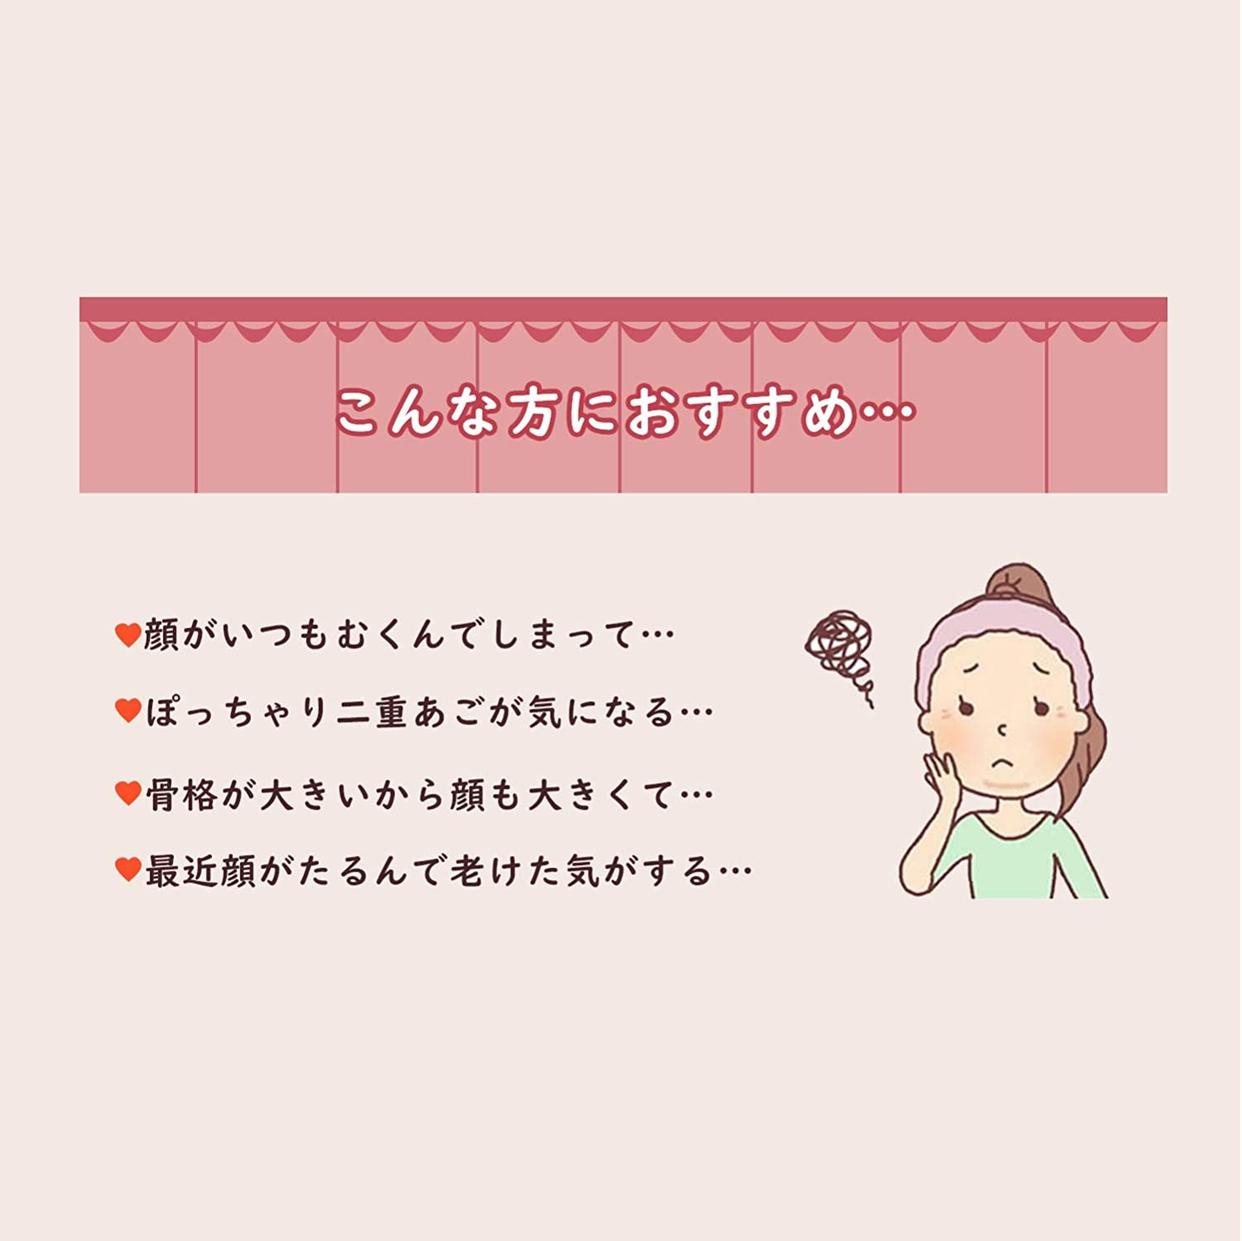 CatMoz(キャットモズ) 小顔美人リフトアップベルト  101004-8000の商品画像6